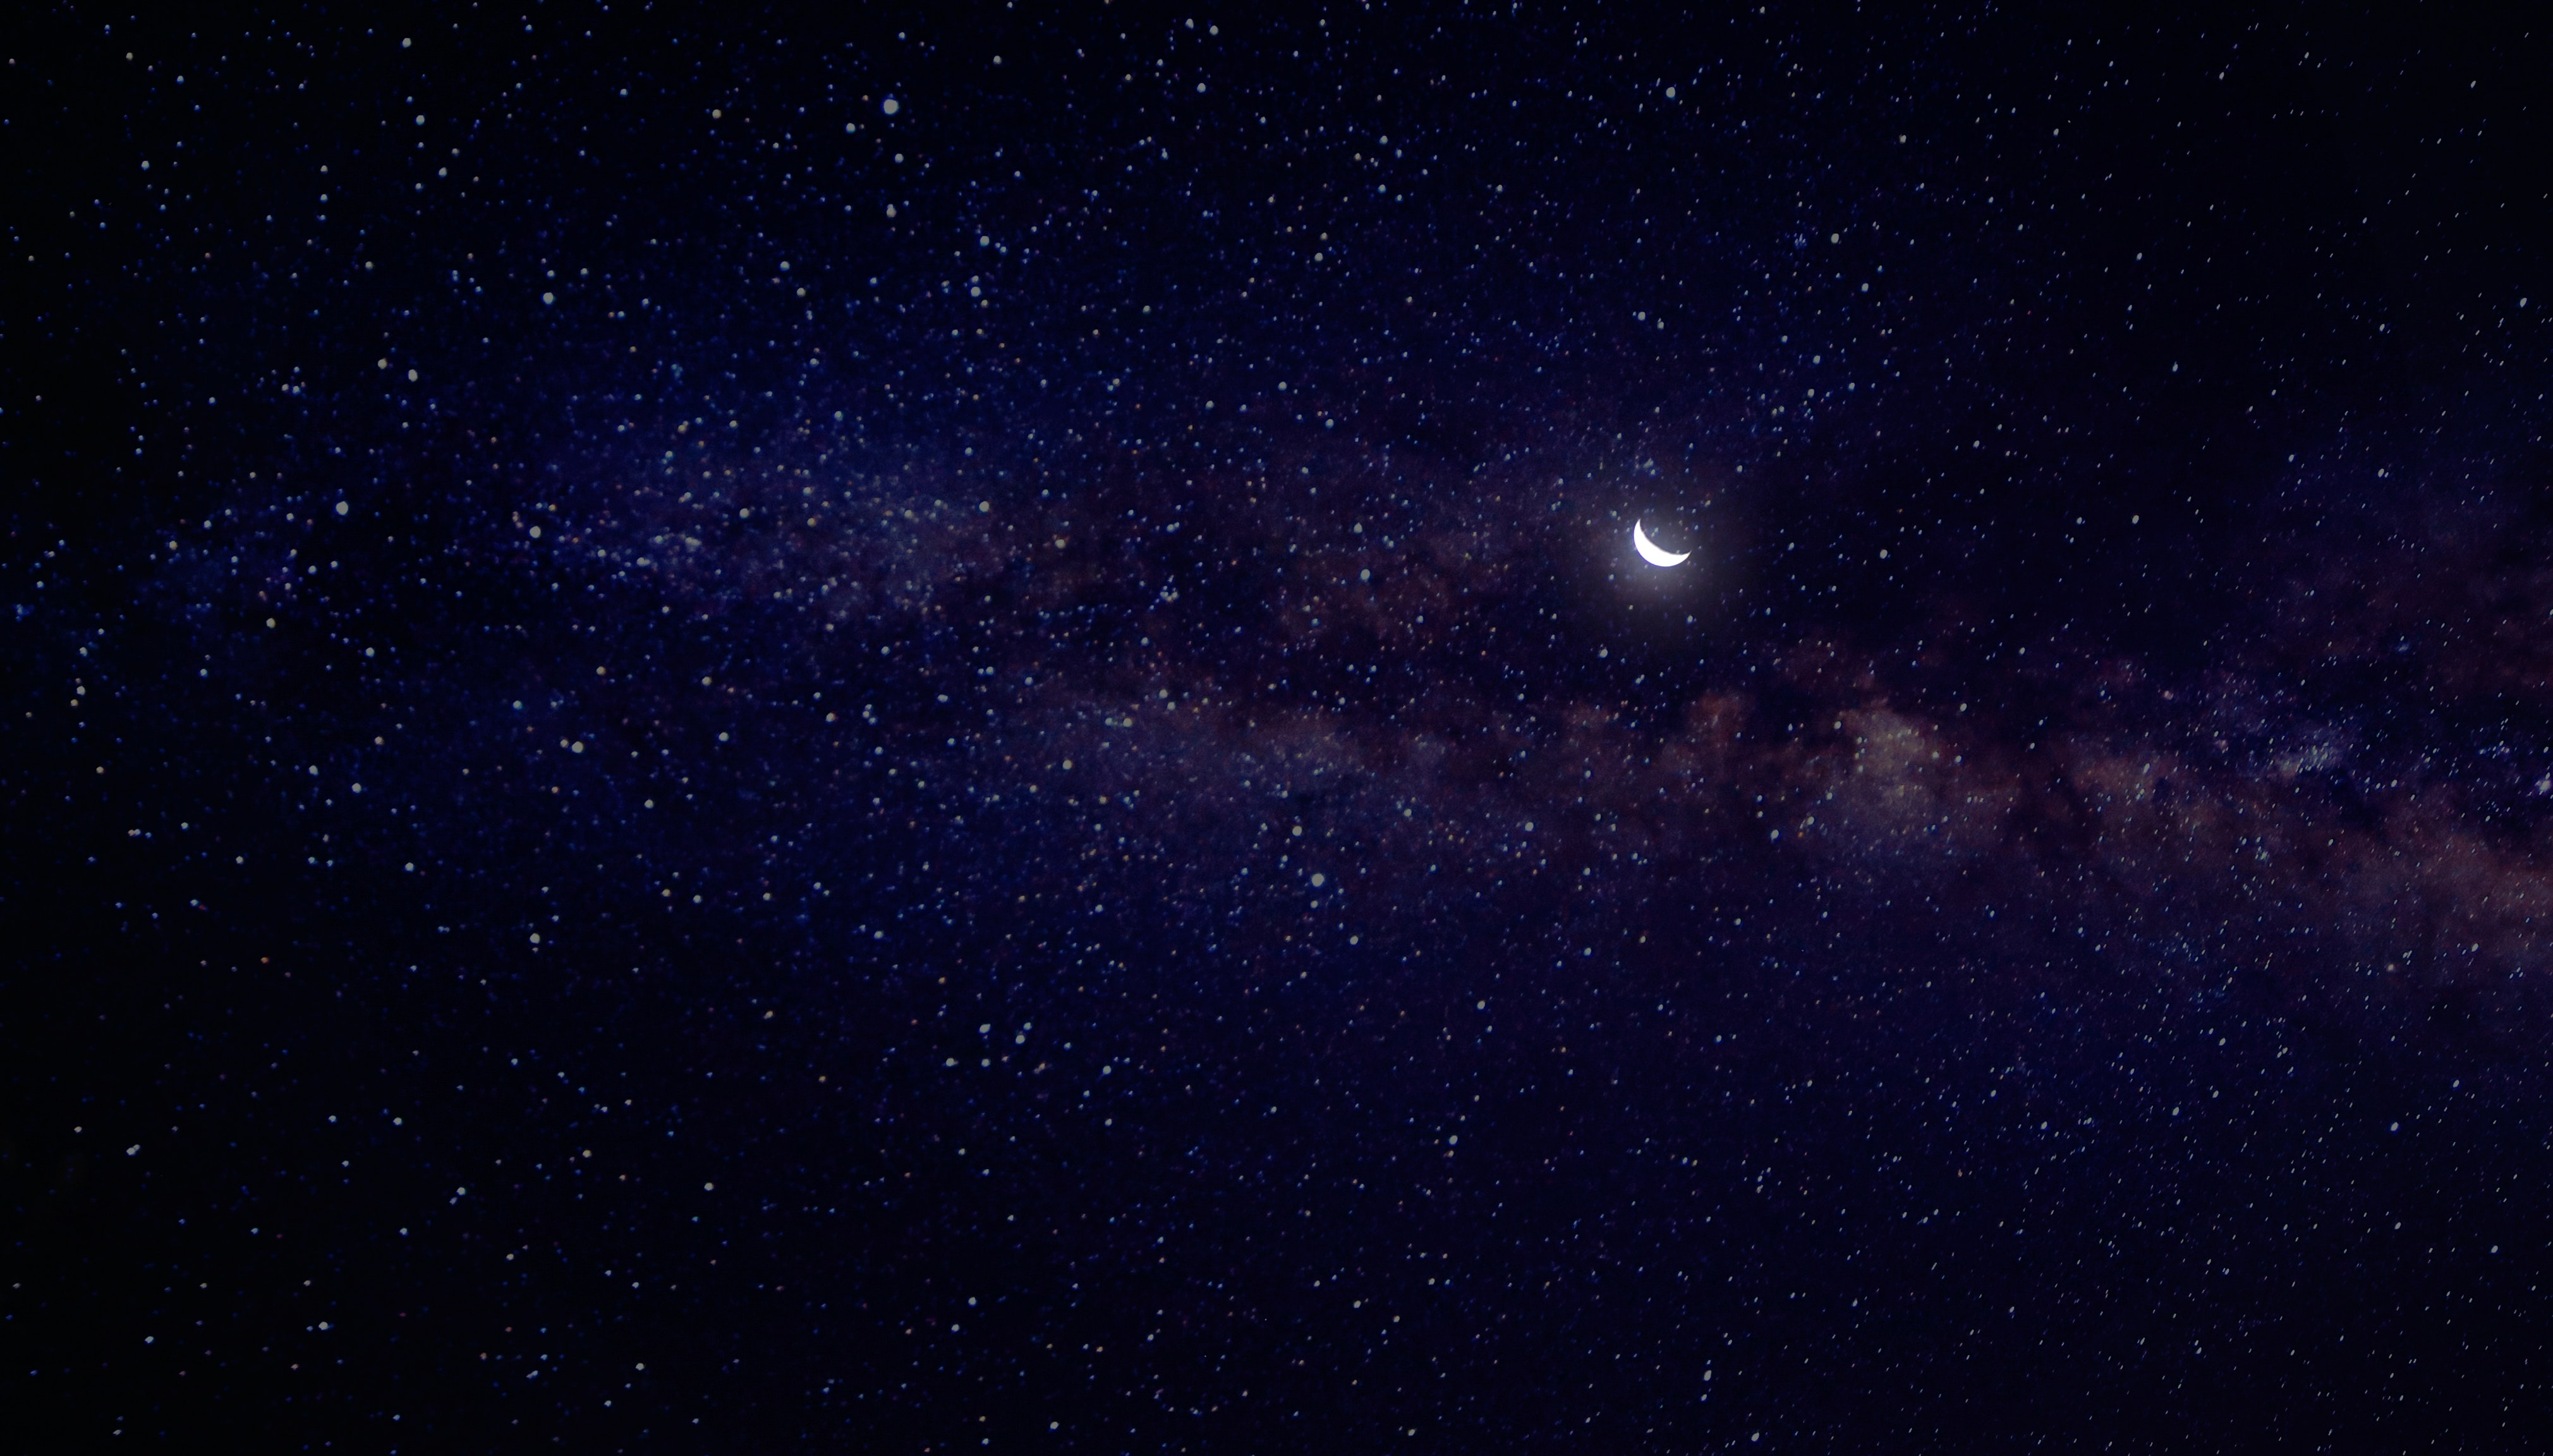 Moon and stars photo